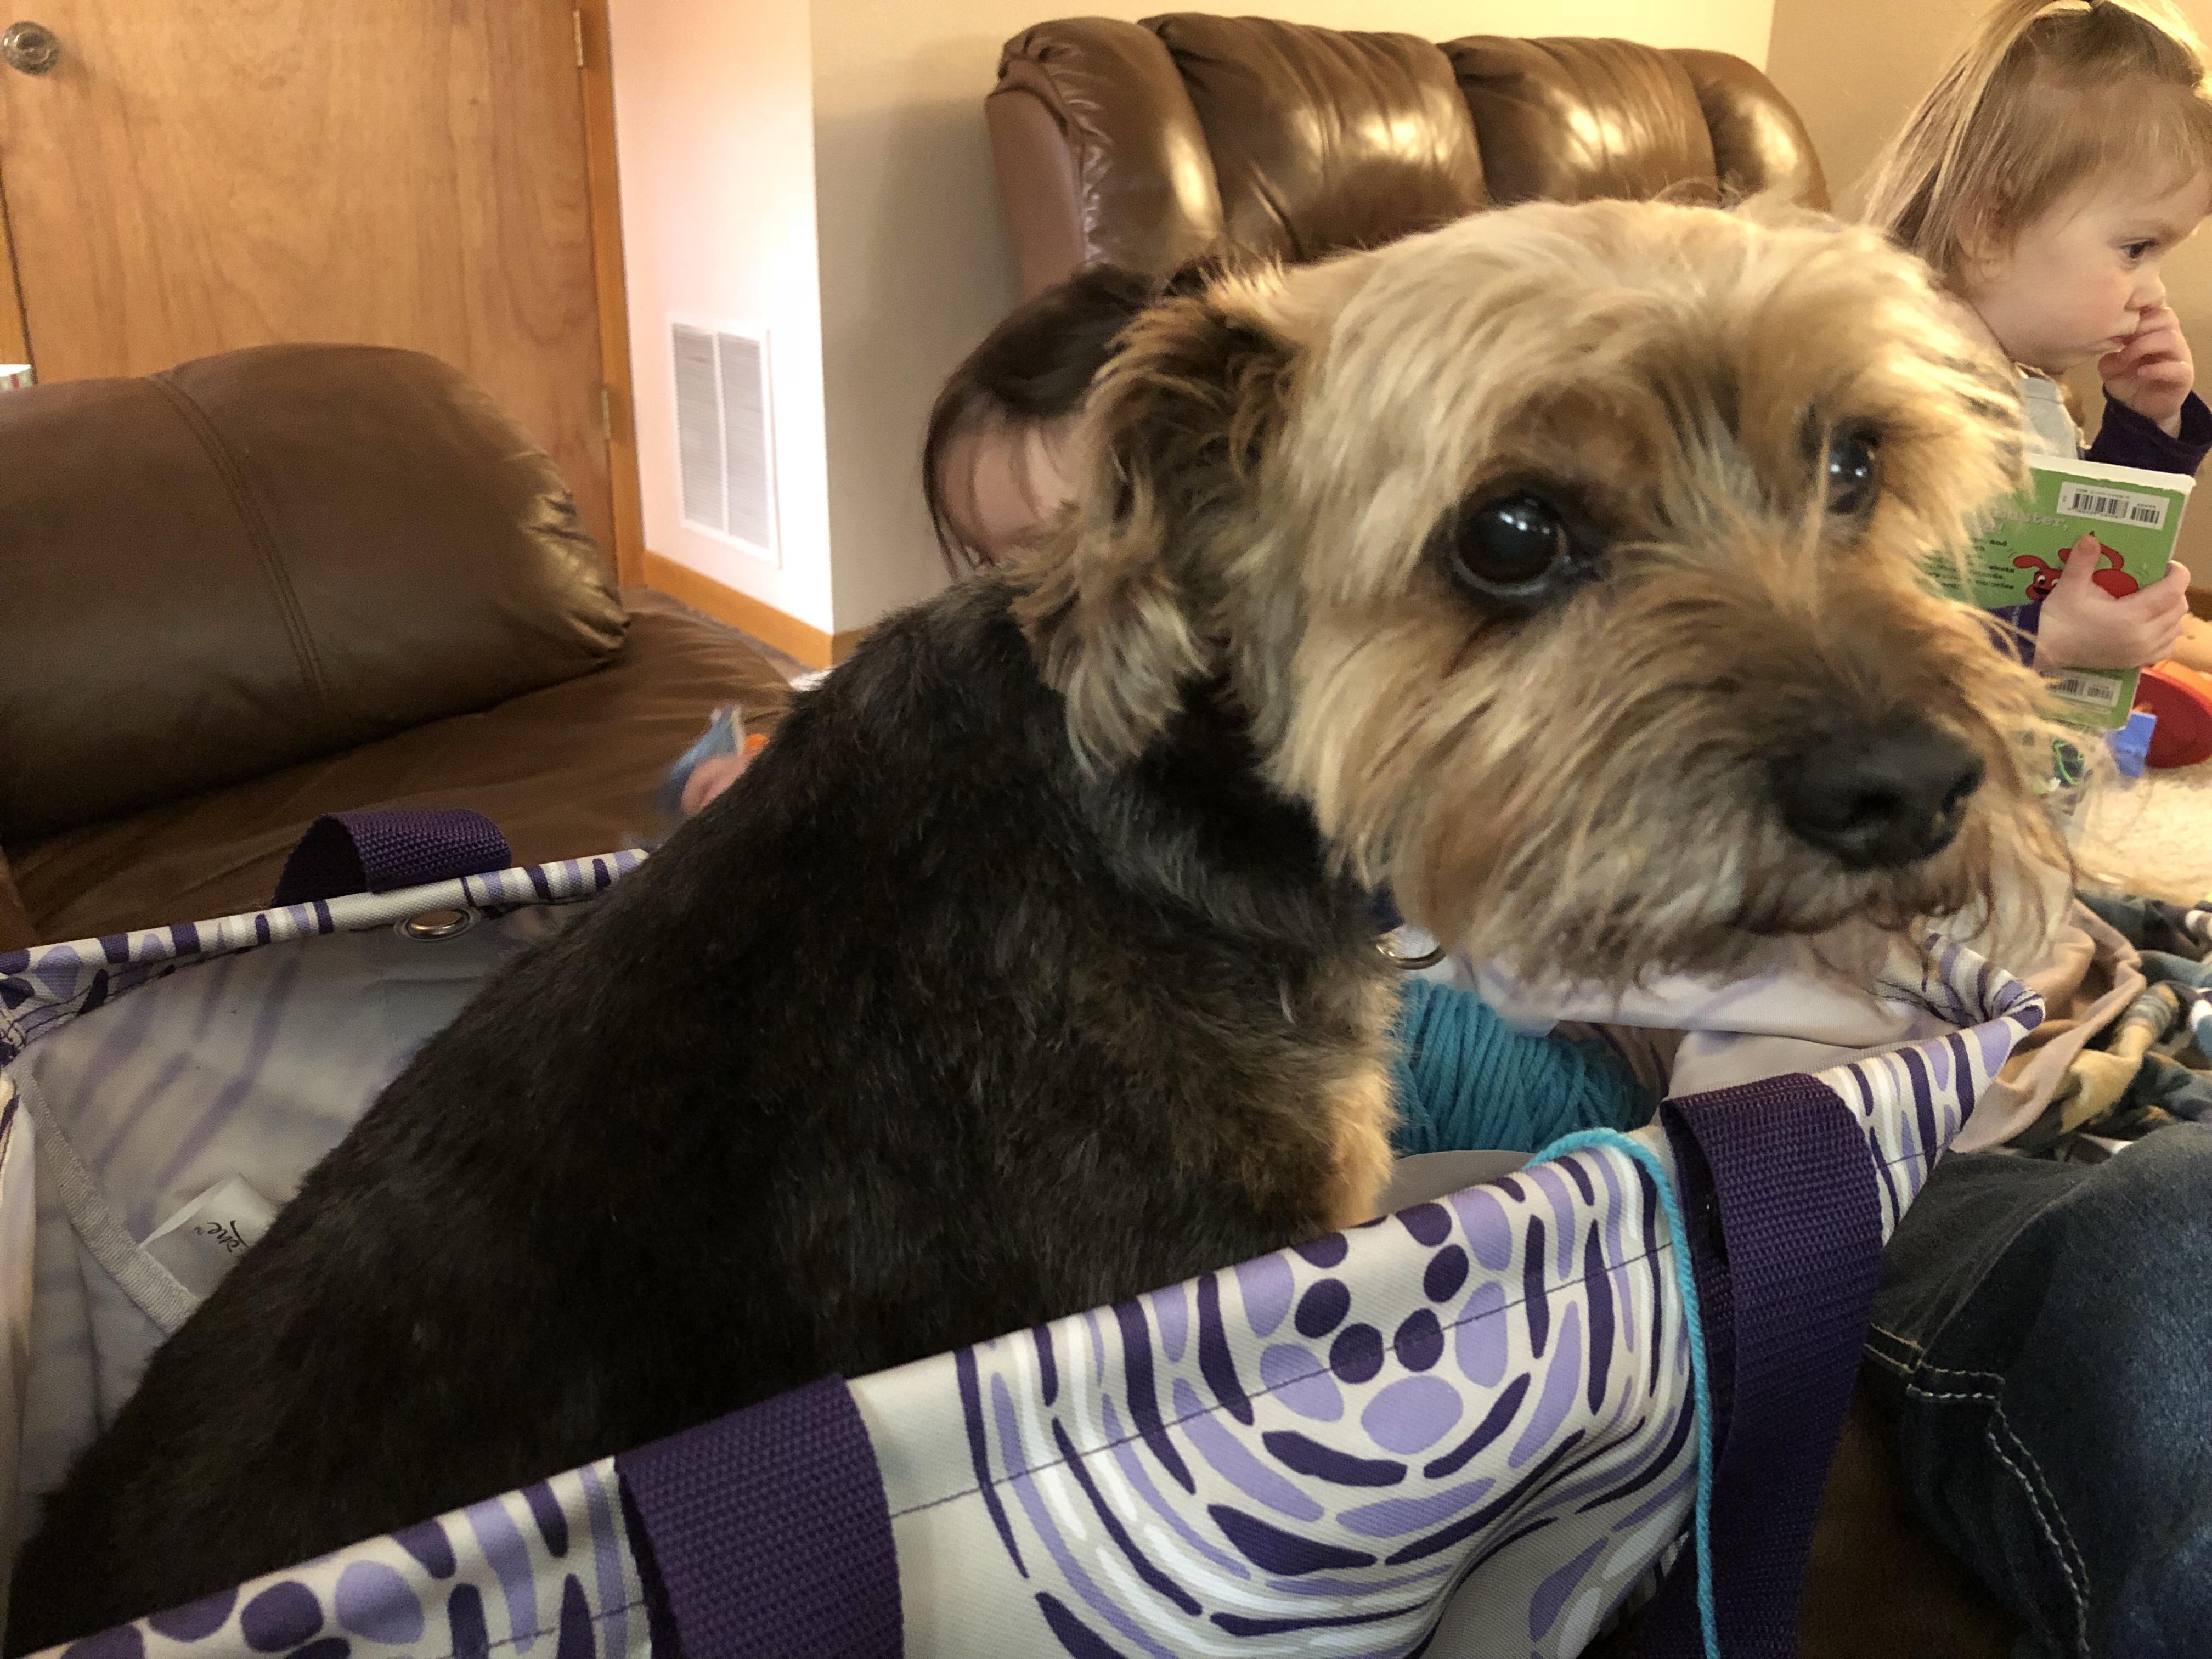 Heath is a Yarn Dog! He climbed in to snuggle my yarn!